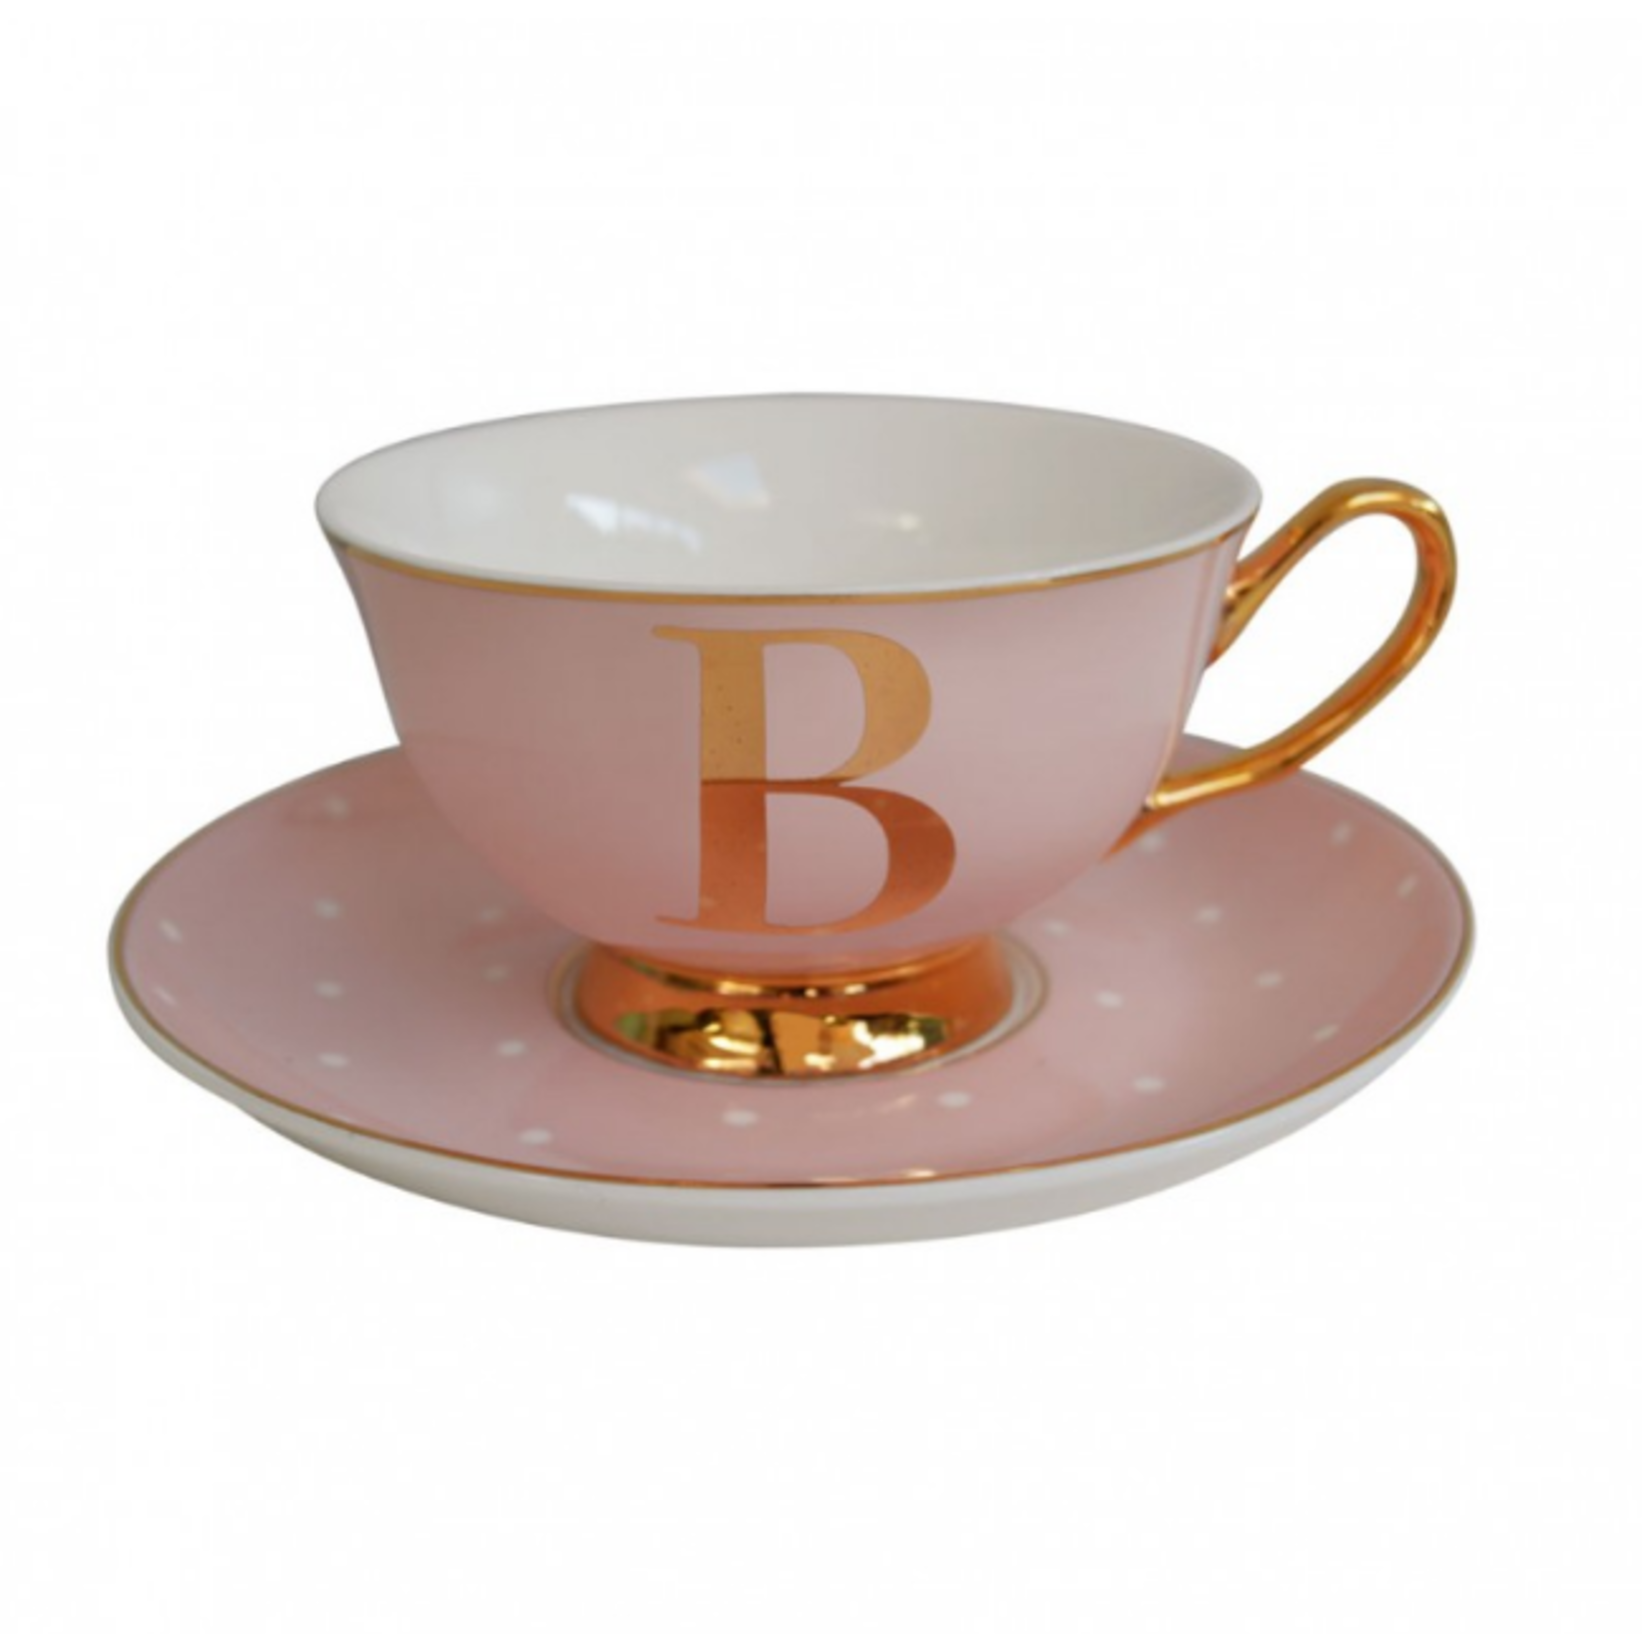 BoDuck Alphabet Spotty Teacup and Saucer Letter B Gold/Tea Rose Pink